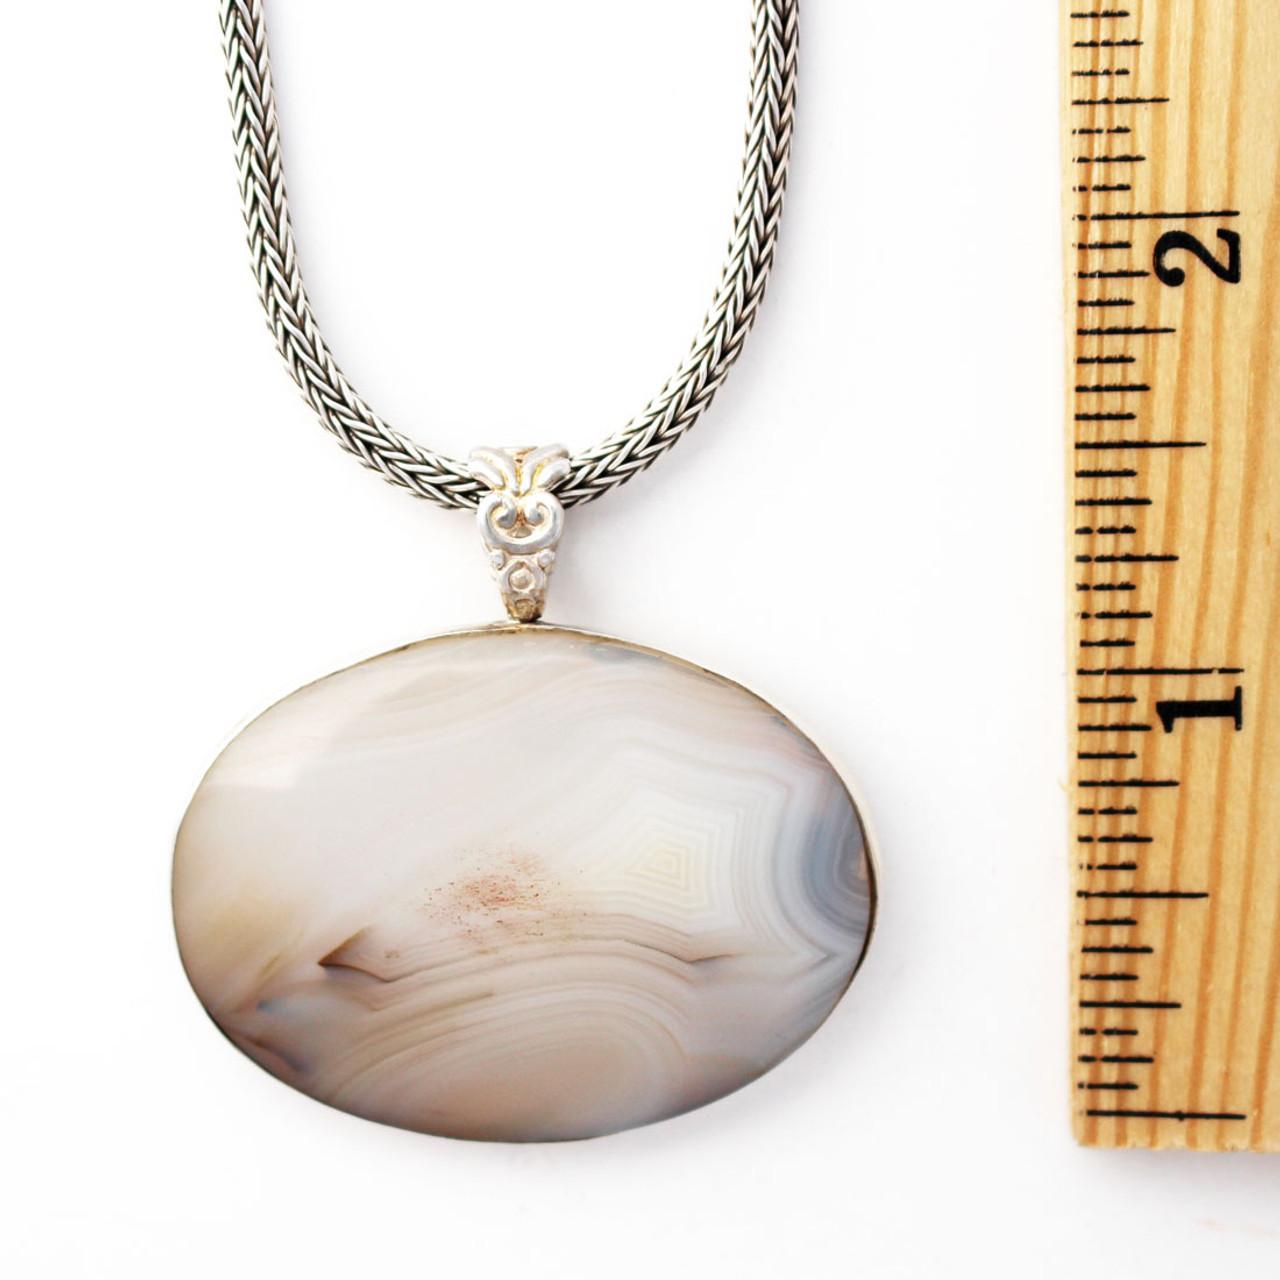 e9dedac2367a8 Handmade Oval White Agate Pendant Sterling Silver